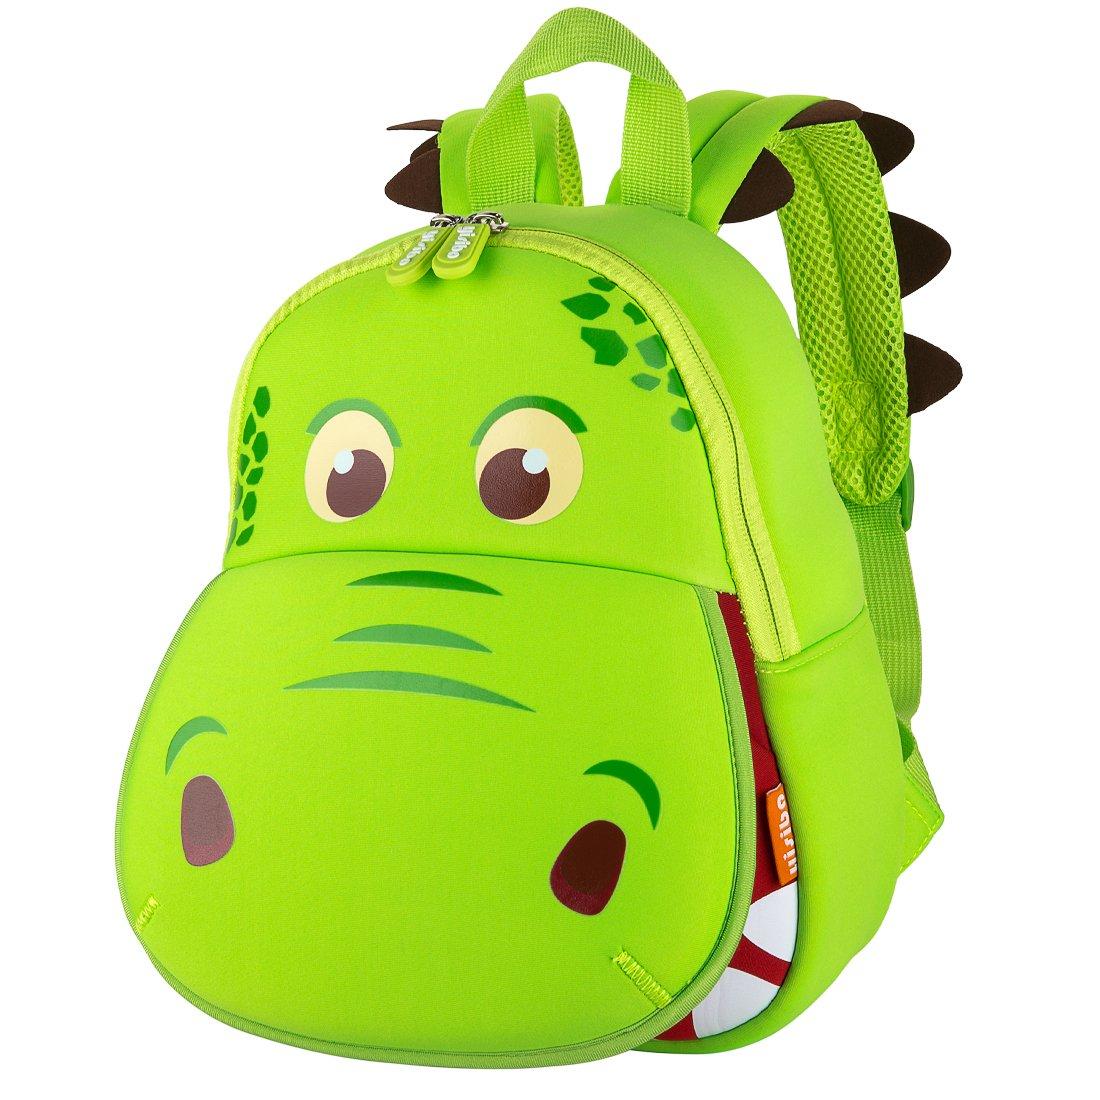 yisibo Cartoon Backpack Waterproof Toddler